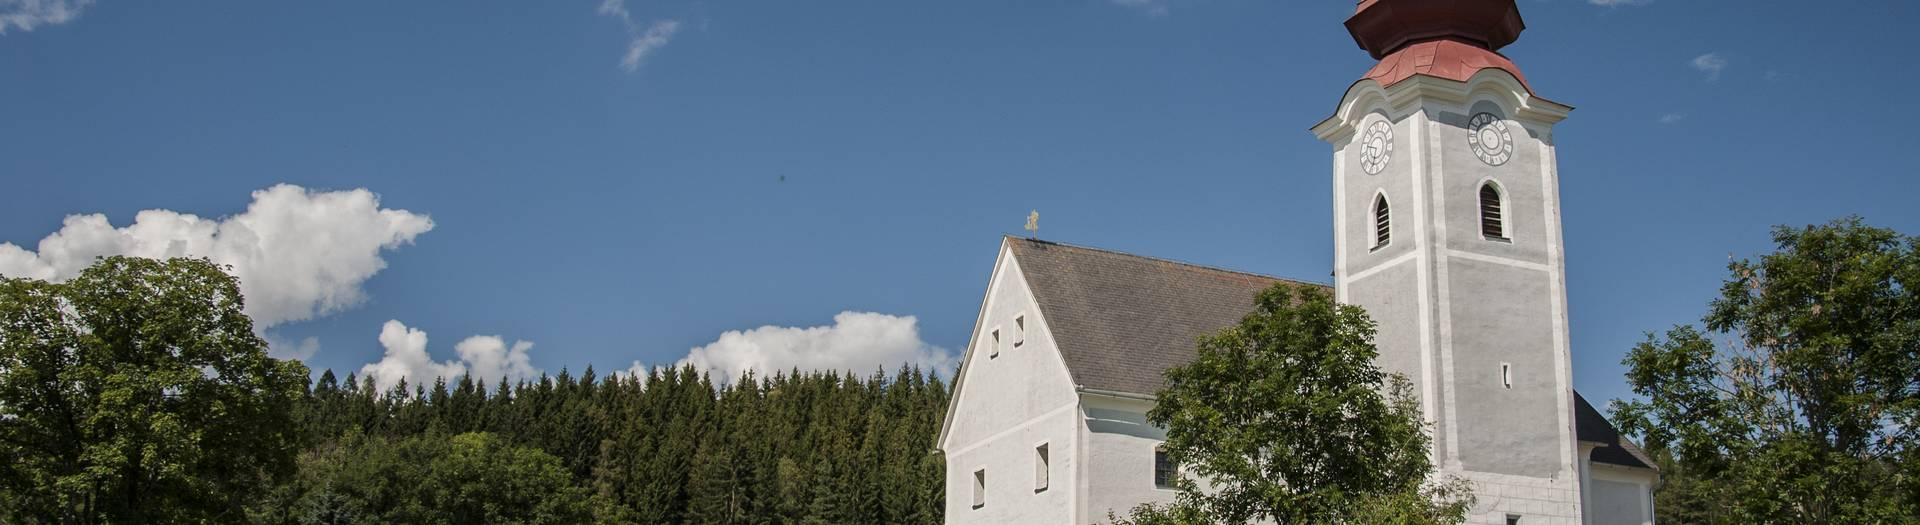 Pfarrkirche Gunzenberg in Mölblng